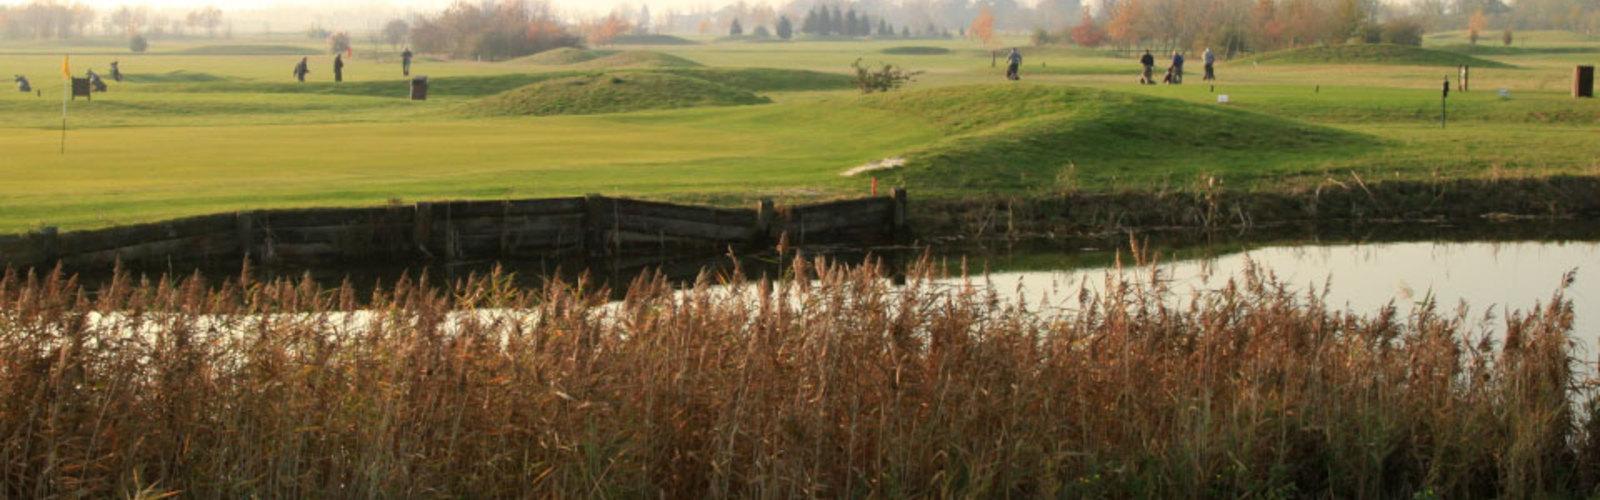 Thorney golf 960x450